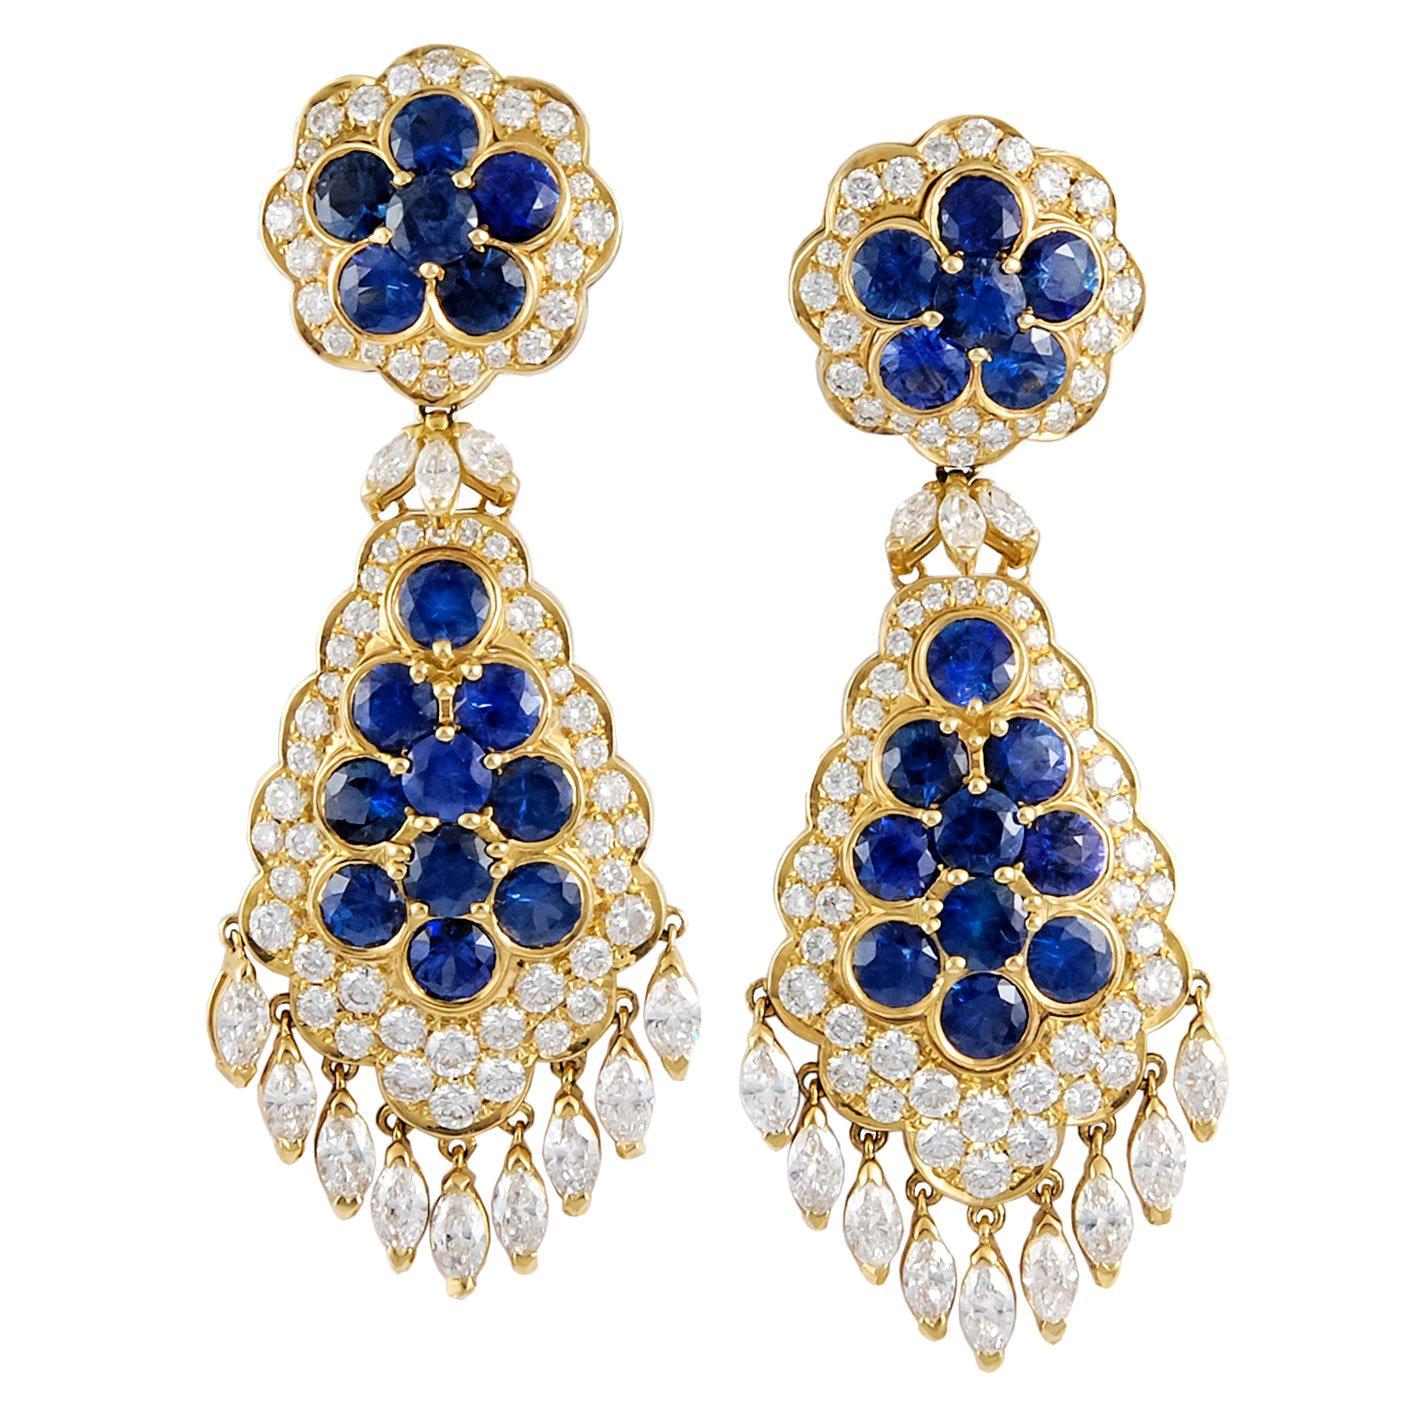 Van Cleef & Arpels Sapphire Diamond Gold Ear Clips